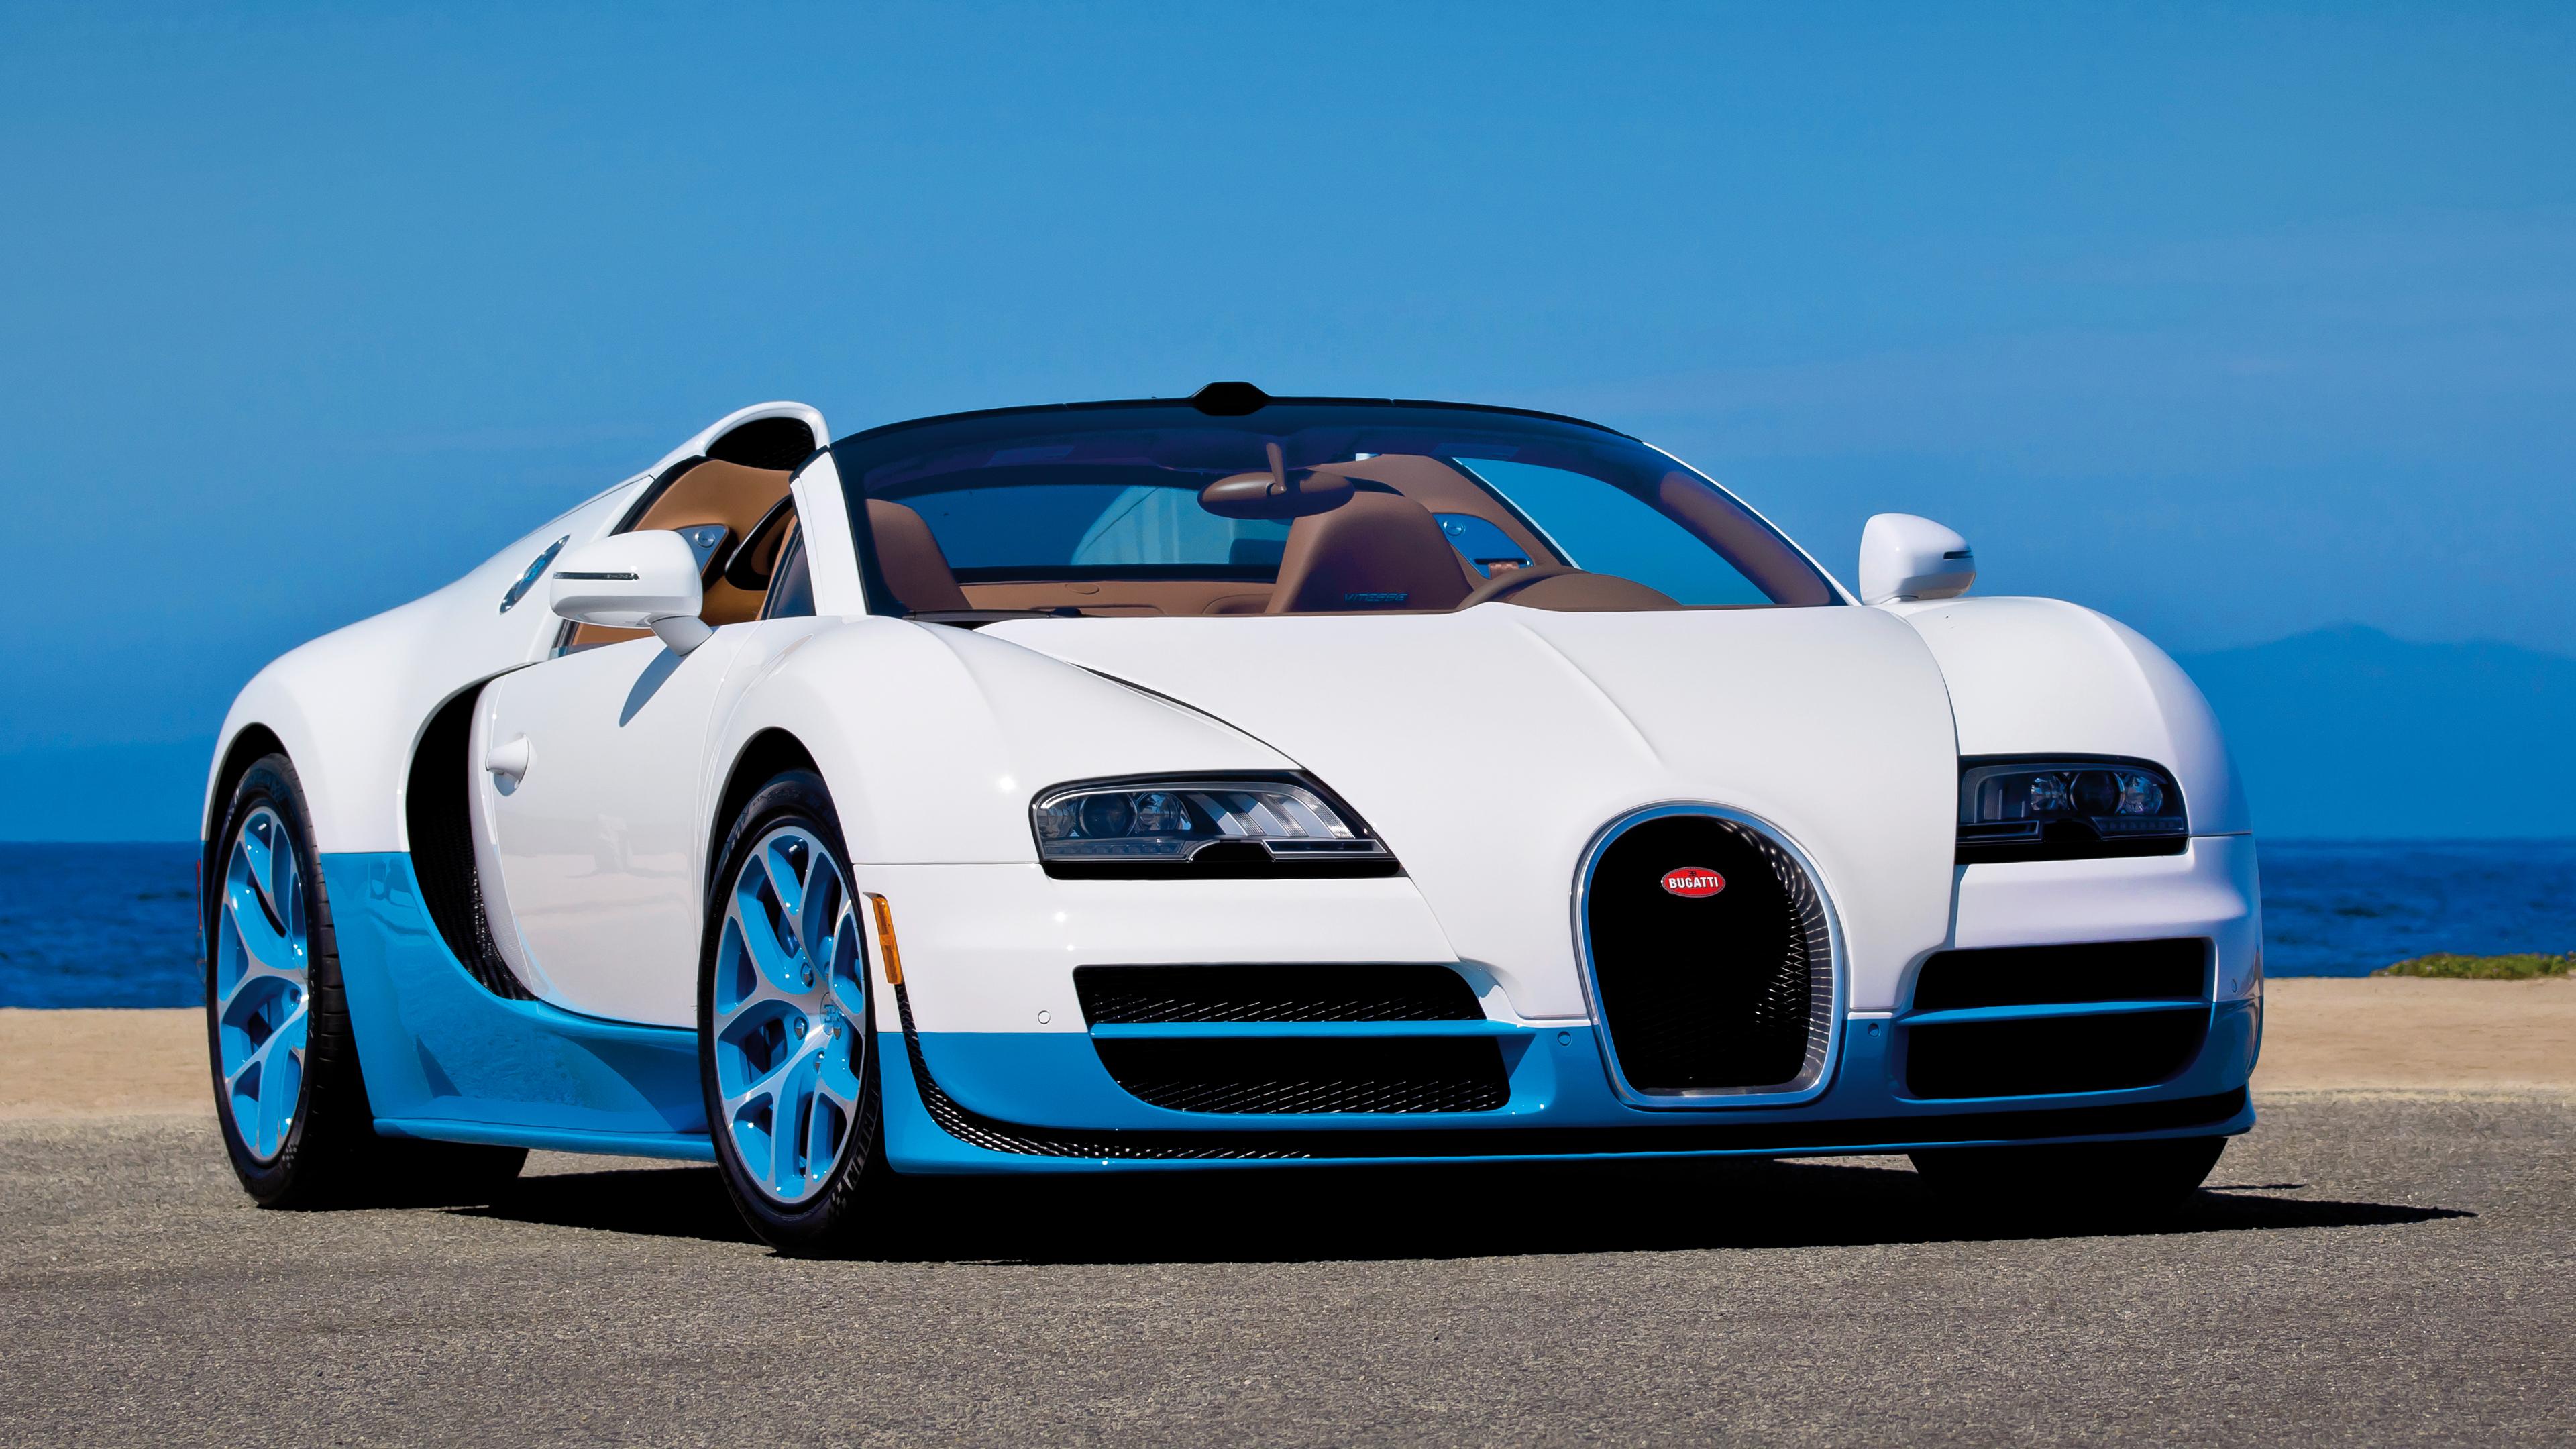 Bugatti Grand Sport Vitesse 4K UHD Wallpaper WallpaperEVO Wallpapers 3840x2160